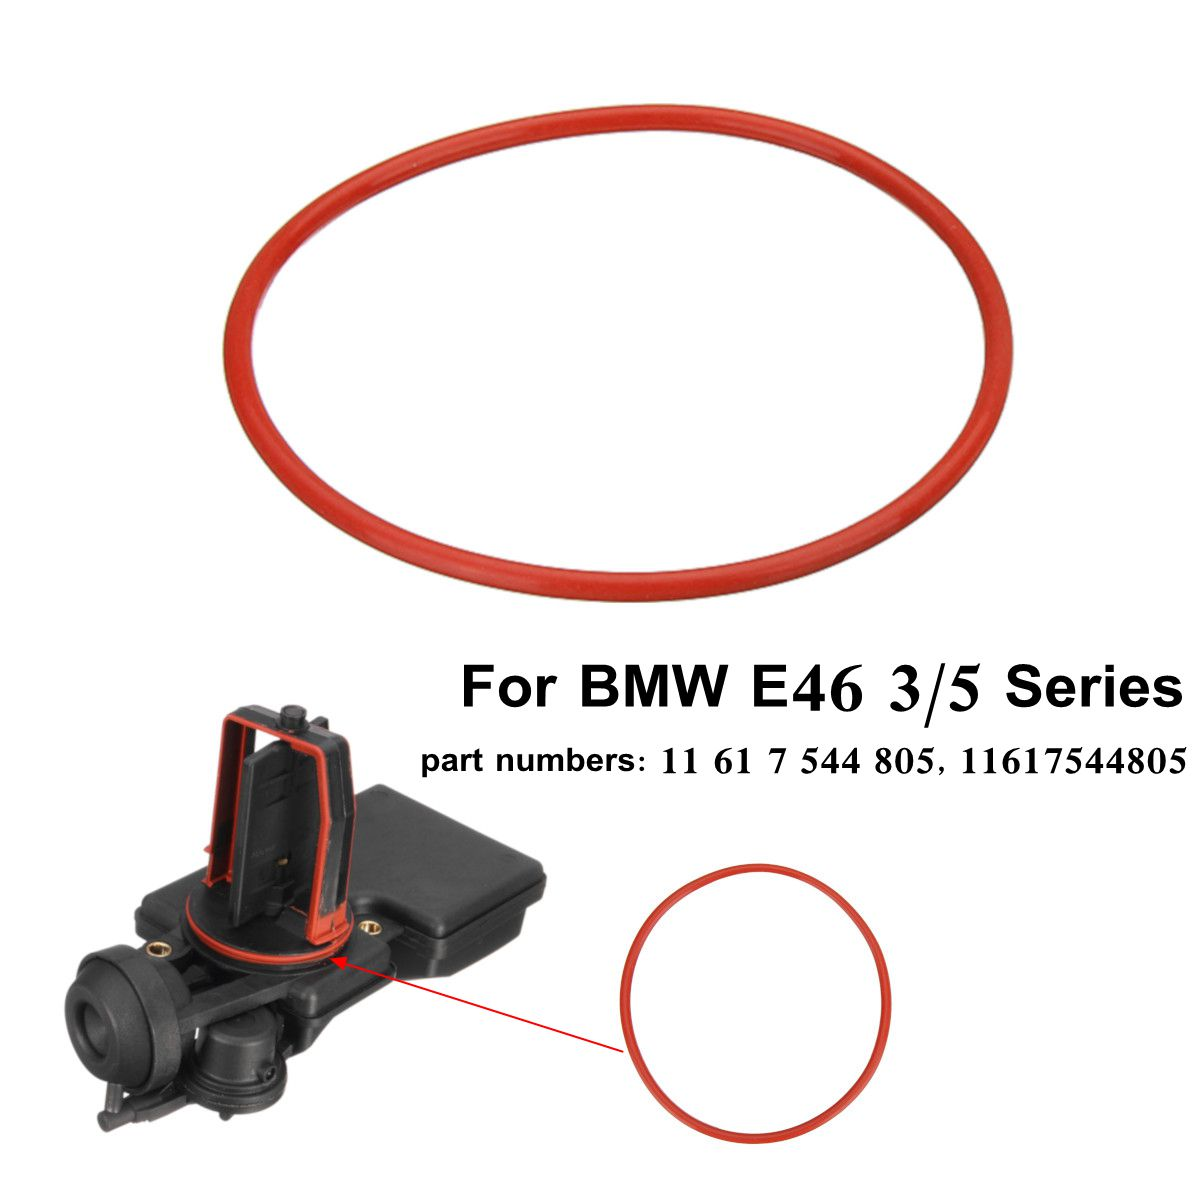 1pc Rubber O-Ring Intake Manifold DISA Valve For BMW E46 3/5 Series 2001-2004 11617544805 /11 61 7 544 805